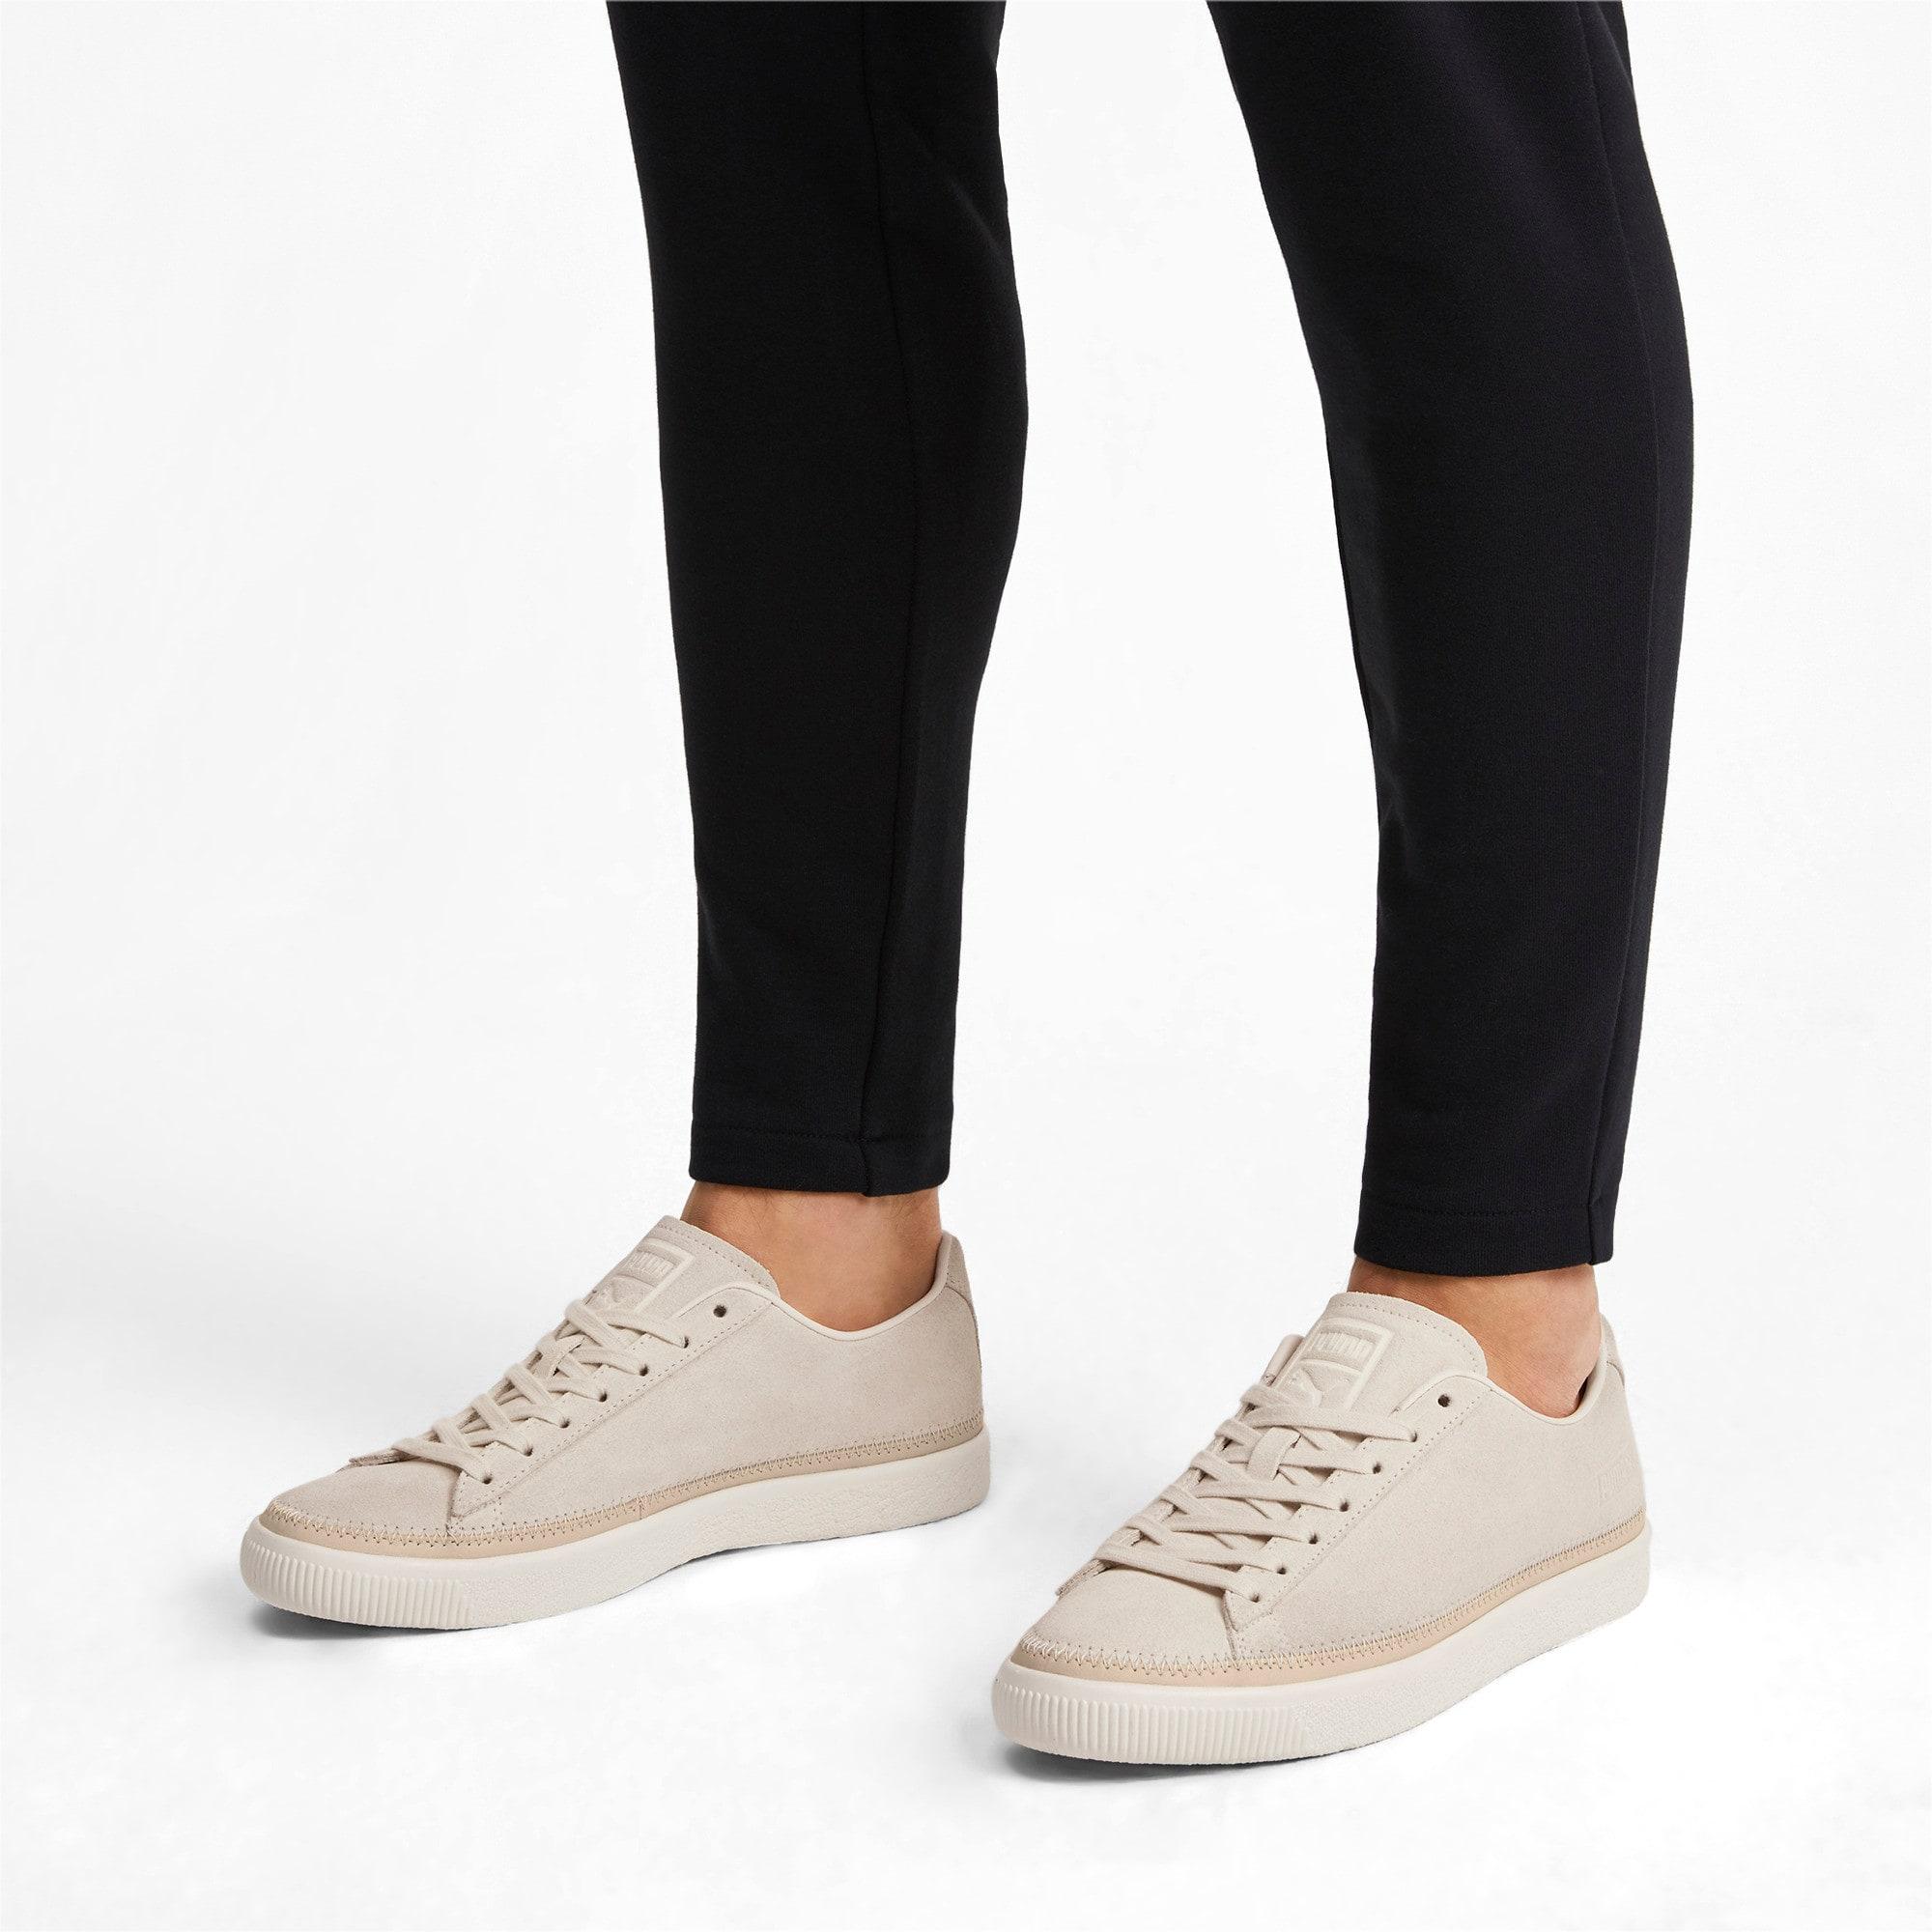 Miniatura 3 de Zapatos deportivos Suede Trim PRM, White Smoke-Whisper White, mediano